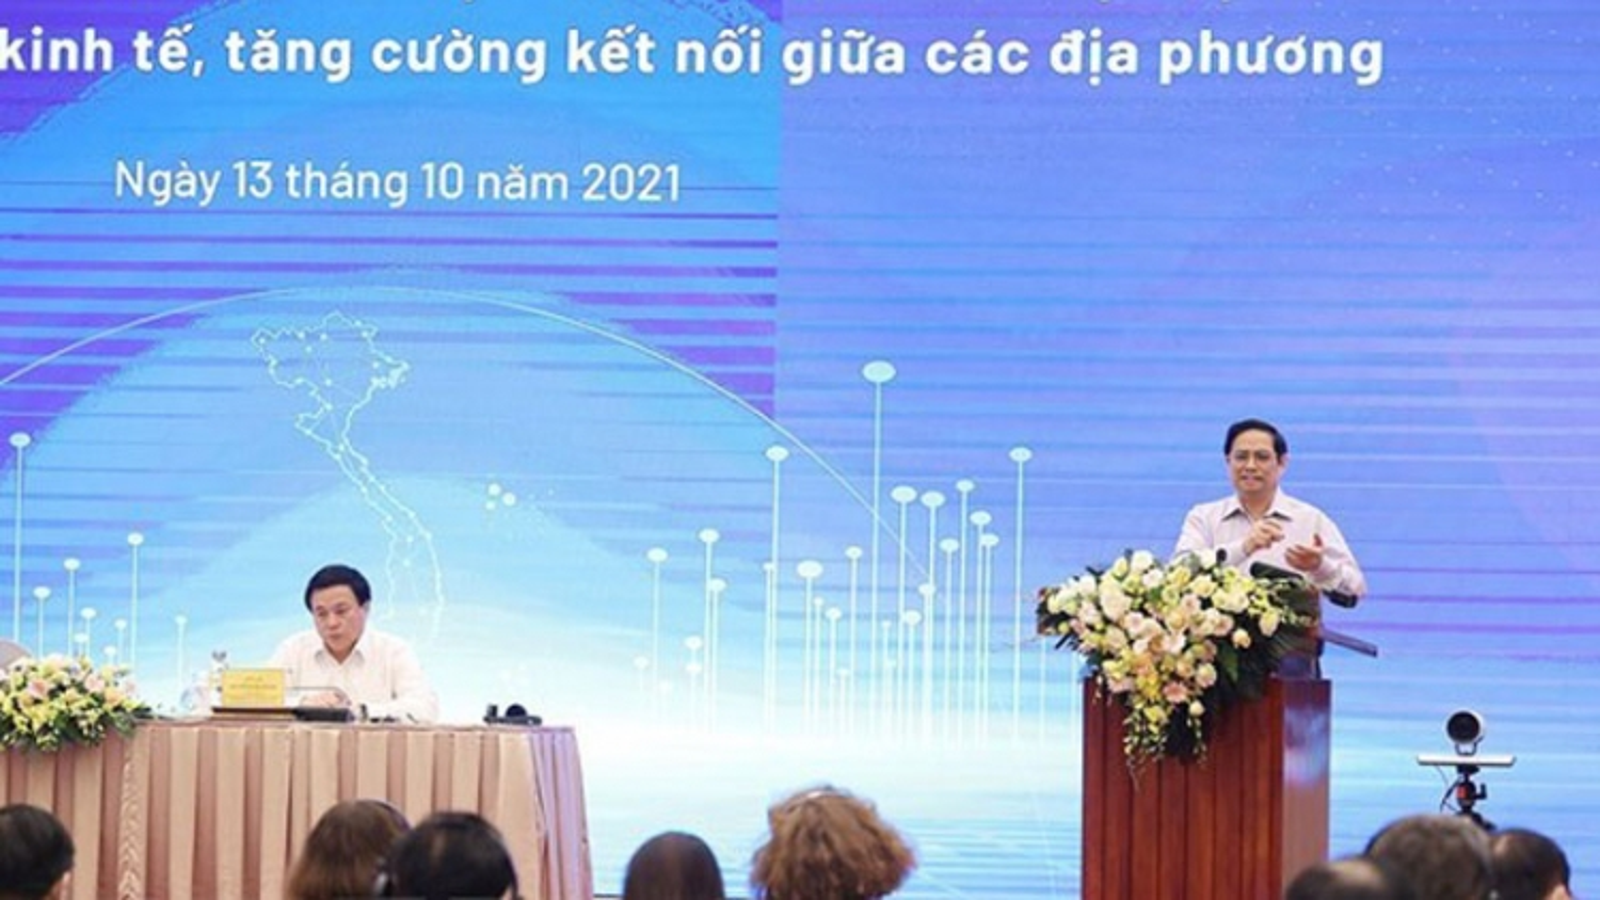 Vietnam persists with pandemic countermeasures, maintains macro-economy: PM